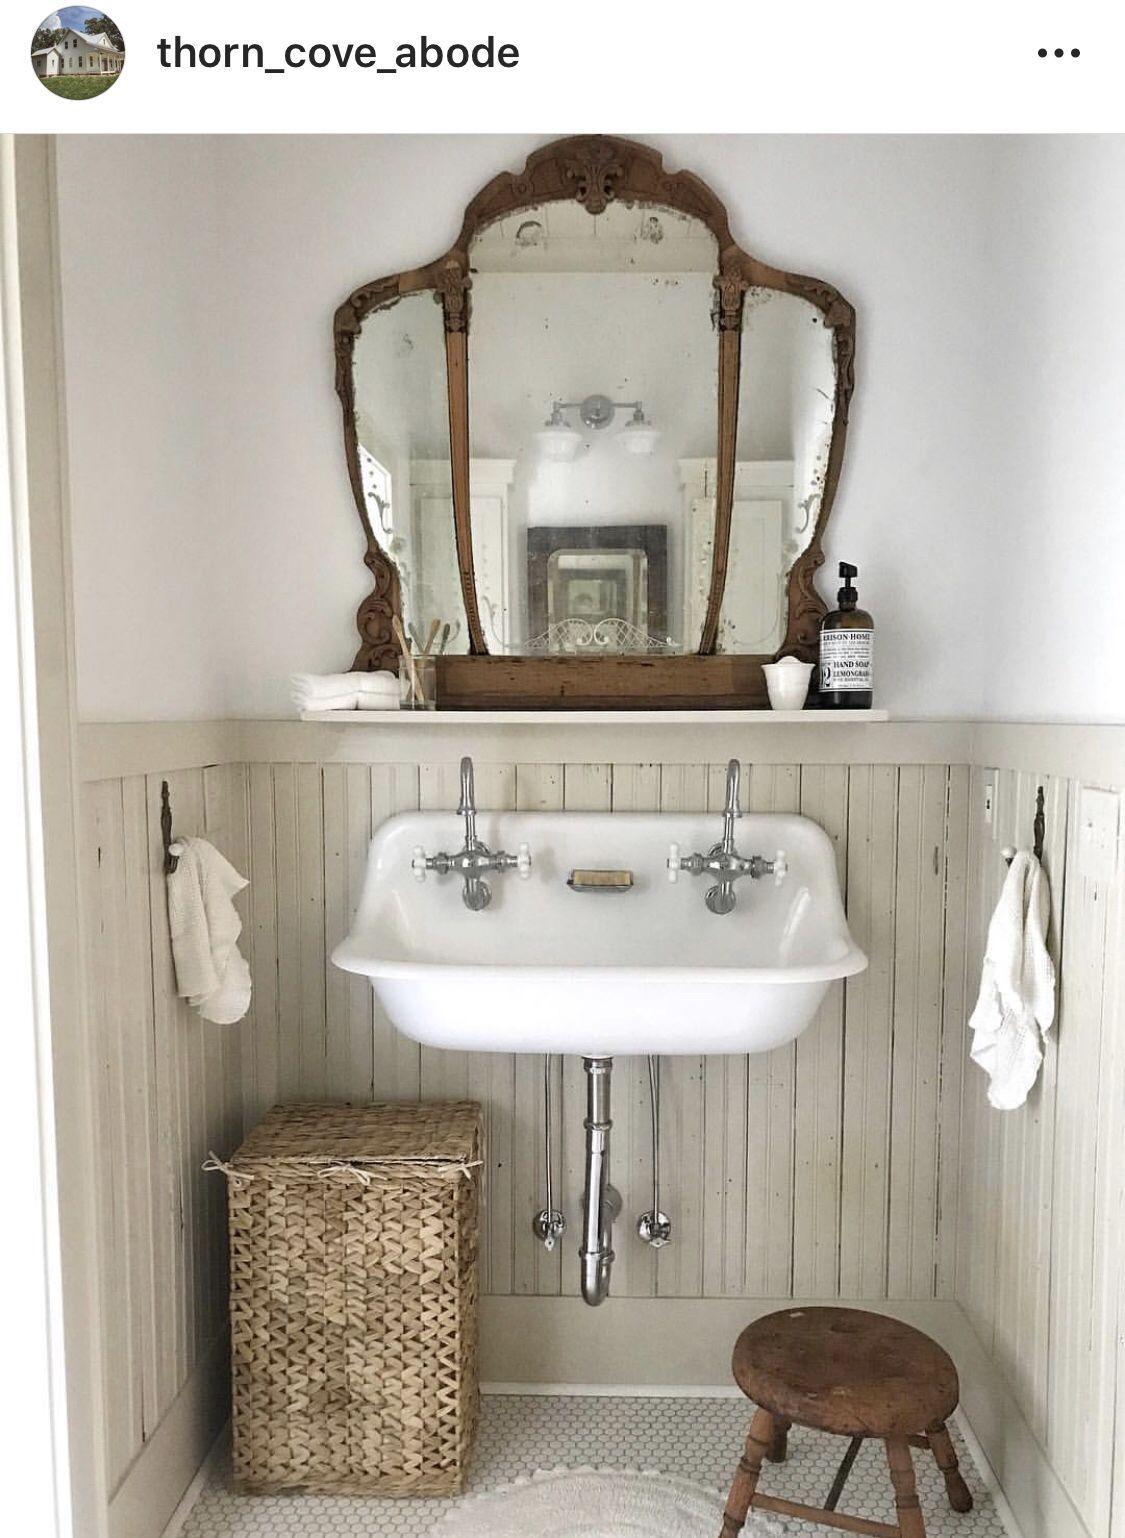 36 Beautiful Farmhouse Bathroom Design And Decor Ideas You Will Go Crazy For House